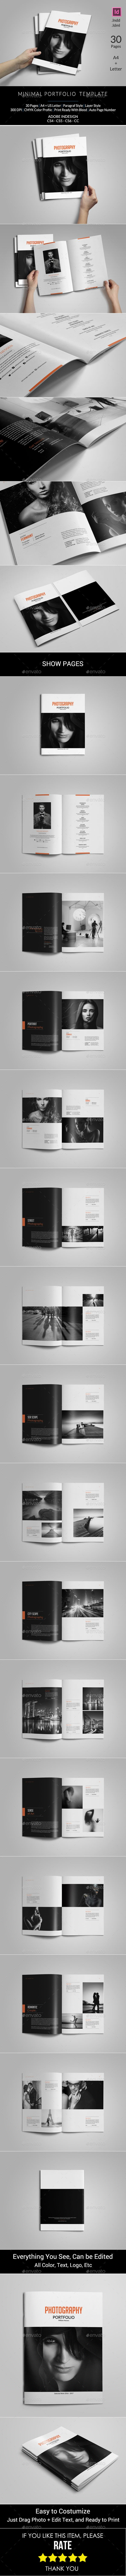 Terrific EPS Portfolio Photographer  Template • Only available here ➝ http://graphicriver.net/item/portfolio-photographer/16278299?ref=pxcr